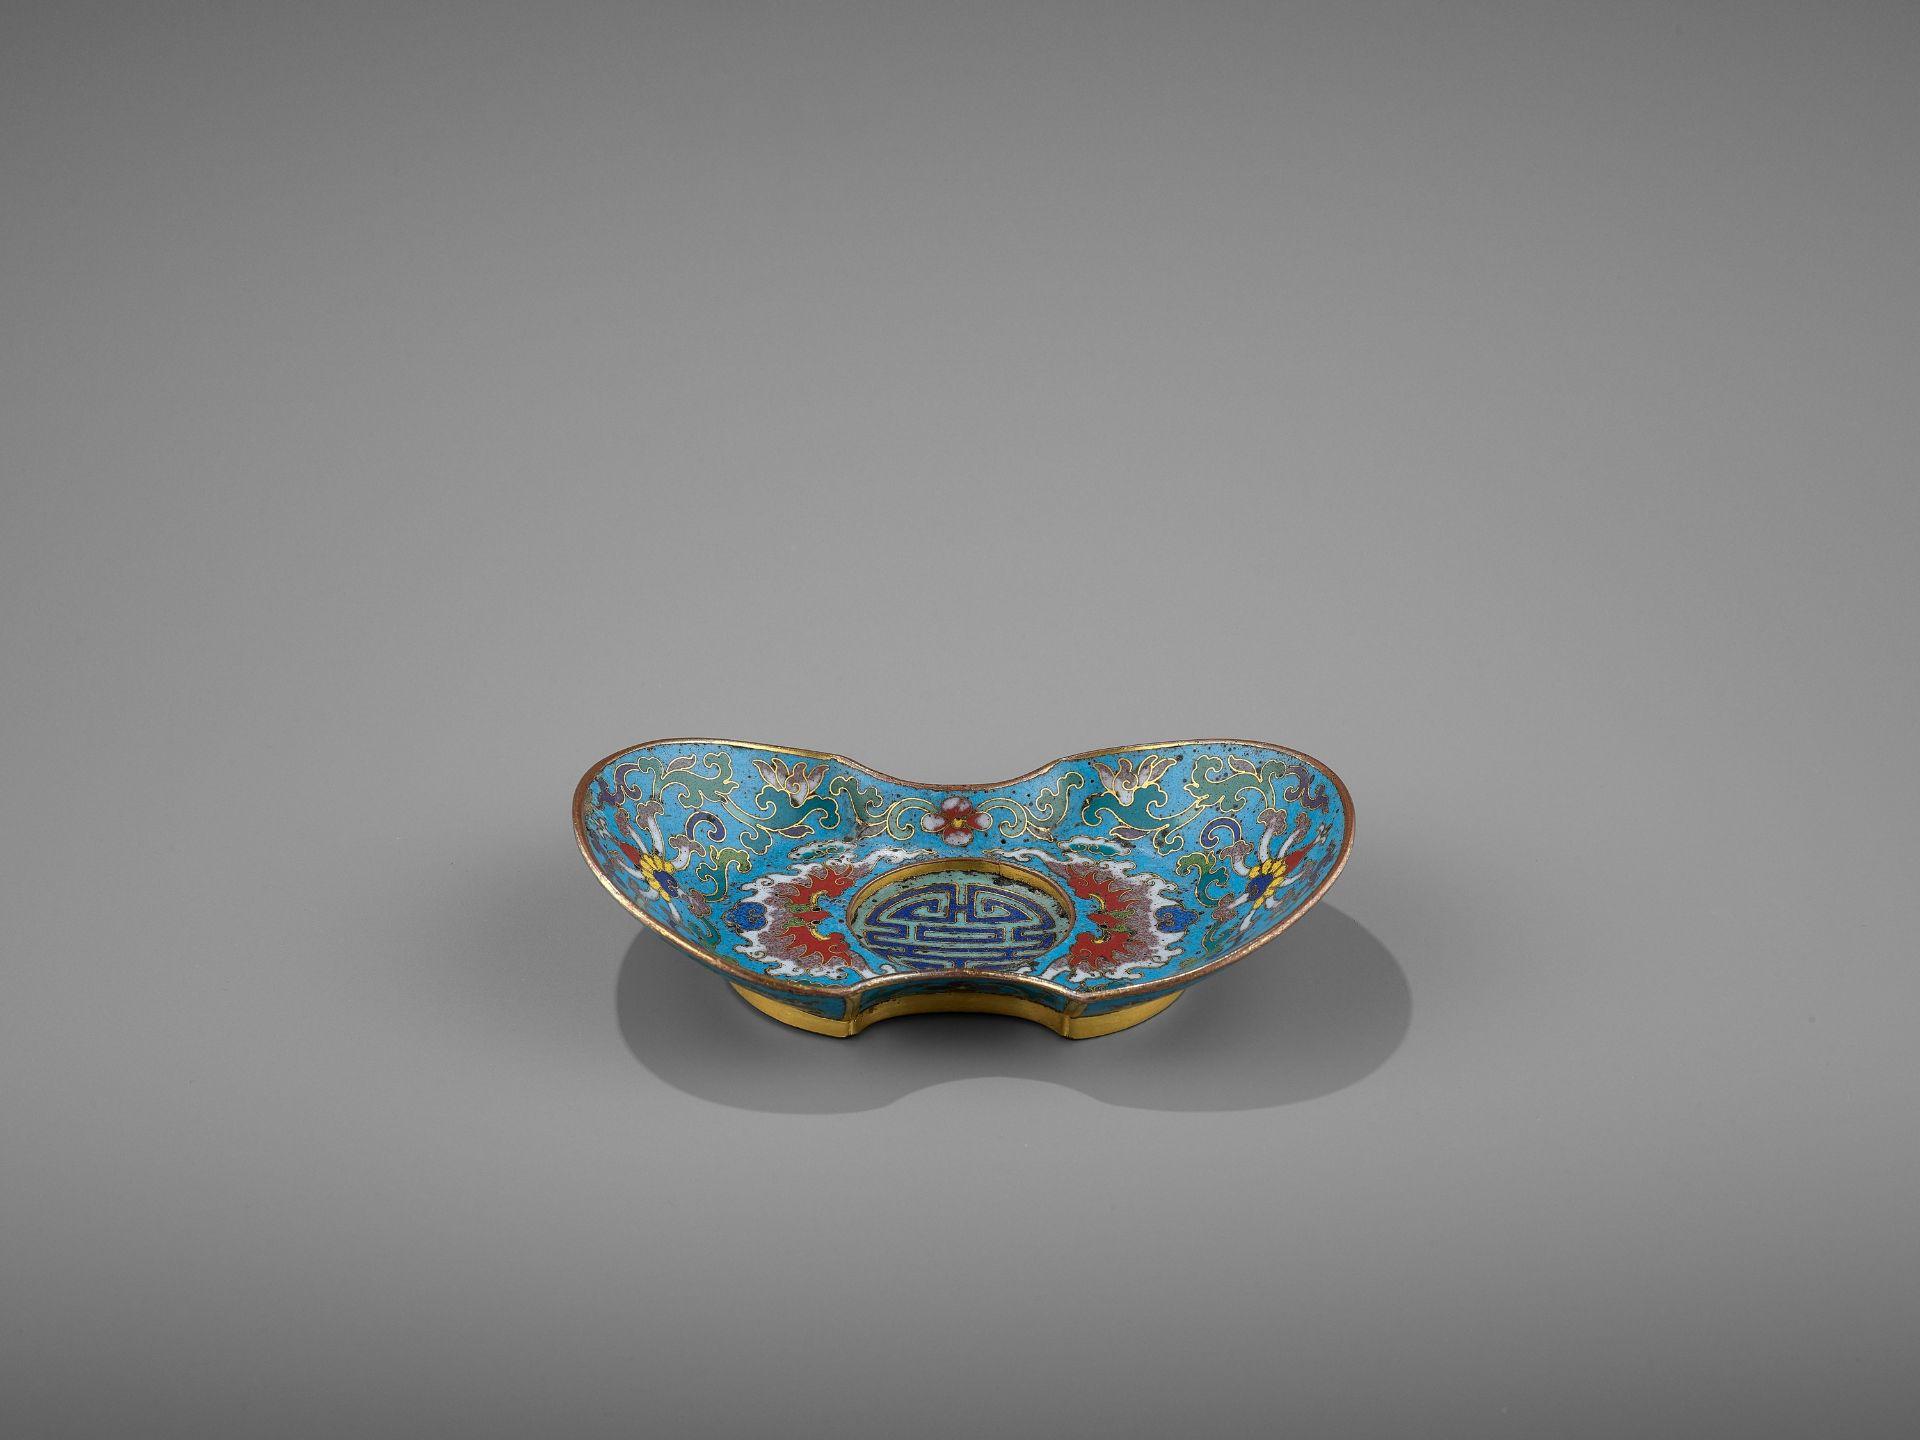 A CLOISONNE AND GILT-BRONZE 'DOUBLE HAPPINESS' CUP STAND, QIANLONG - Bild 8 aus 10